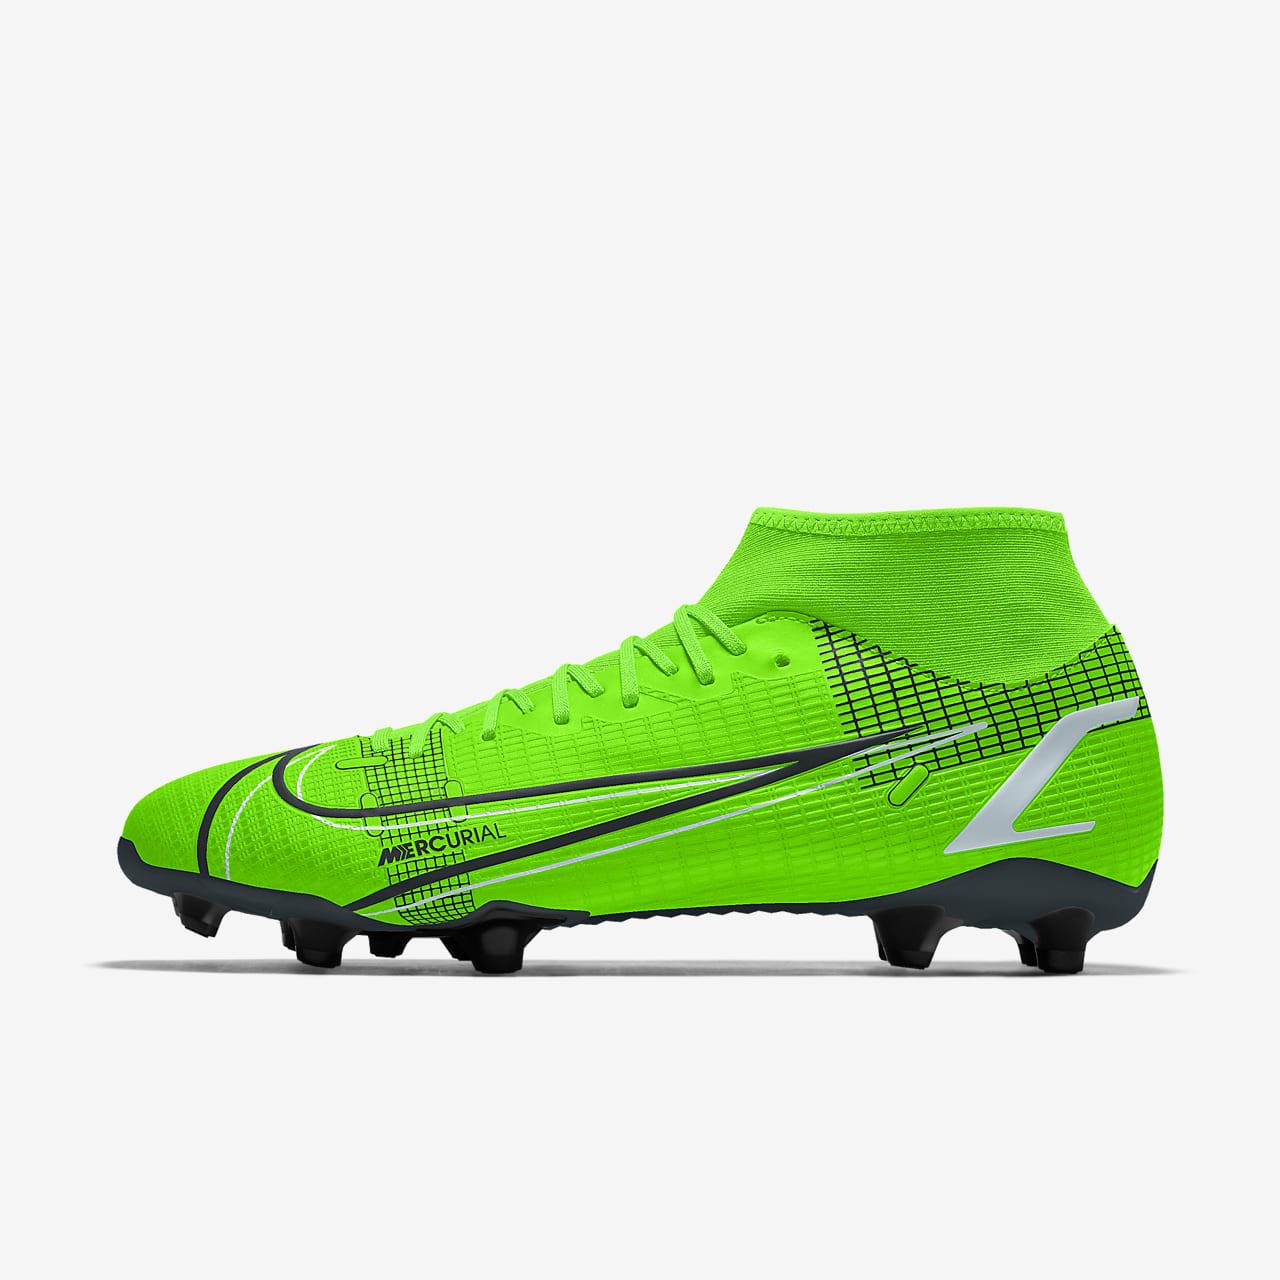 Nike Mercurial Superfly 8 Academy By You Custom Football Boot